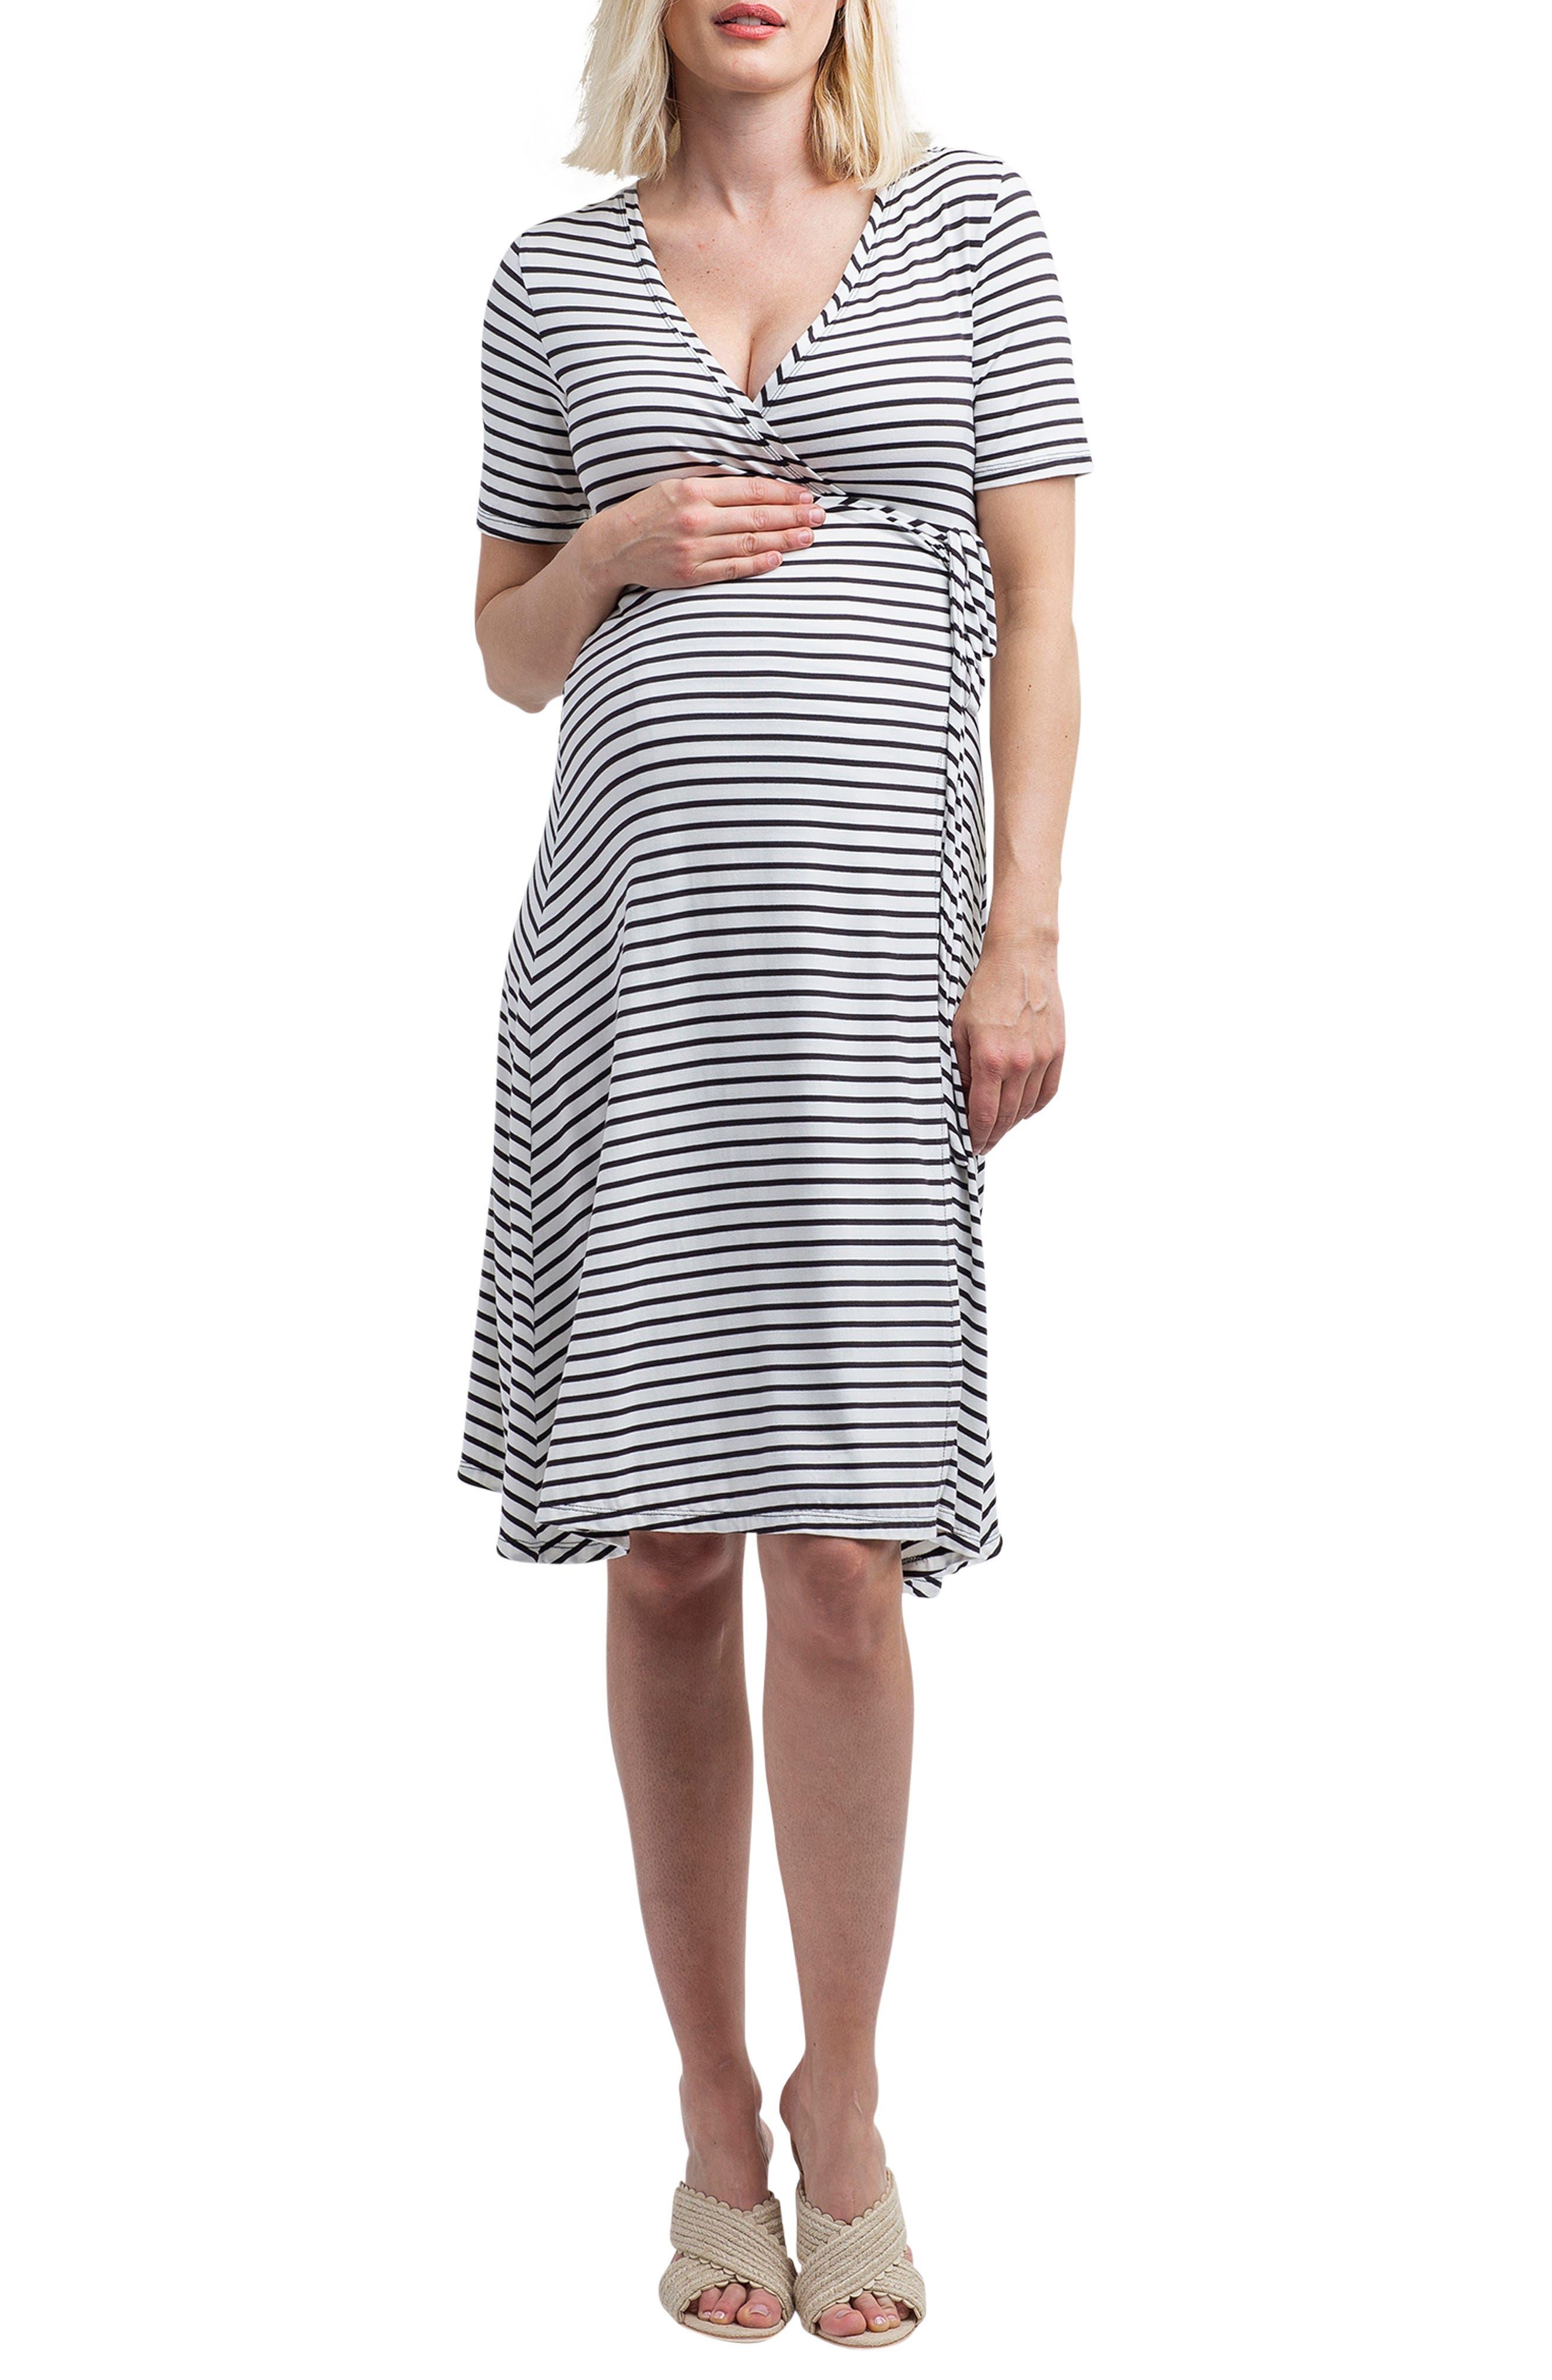 a54534eeb28 Catherine Catherine Malandrino Short Sleeve Floral Print Faux Wrap Dress  Multi Pattern